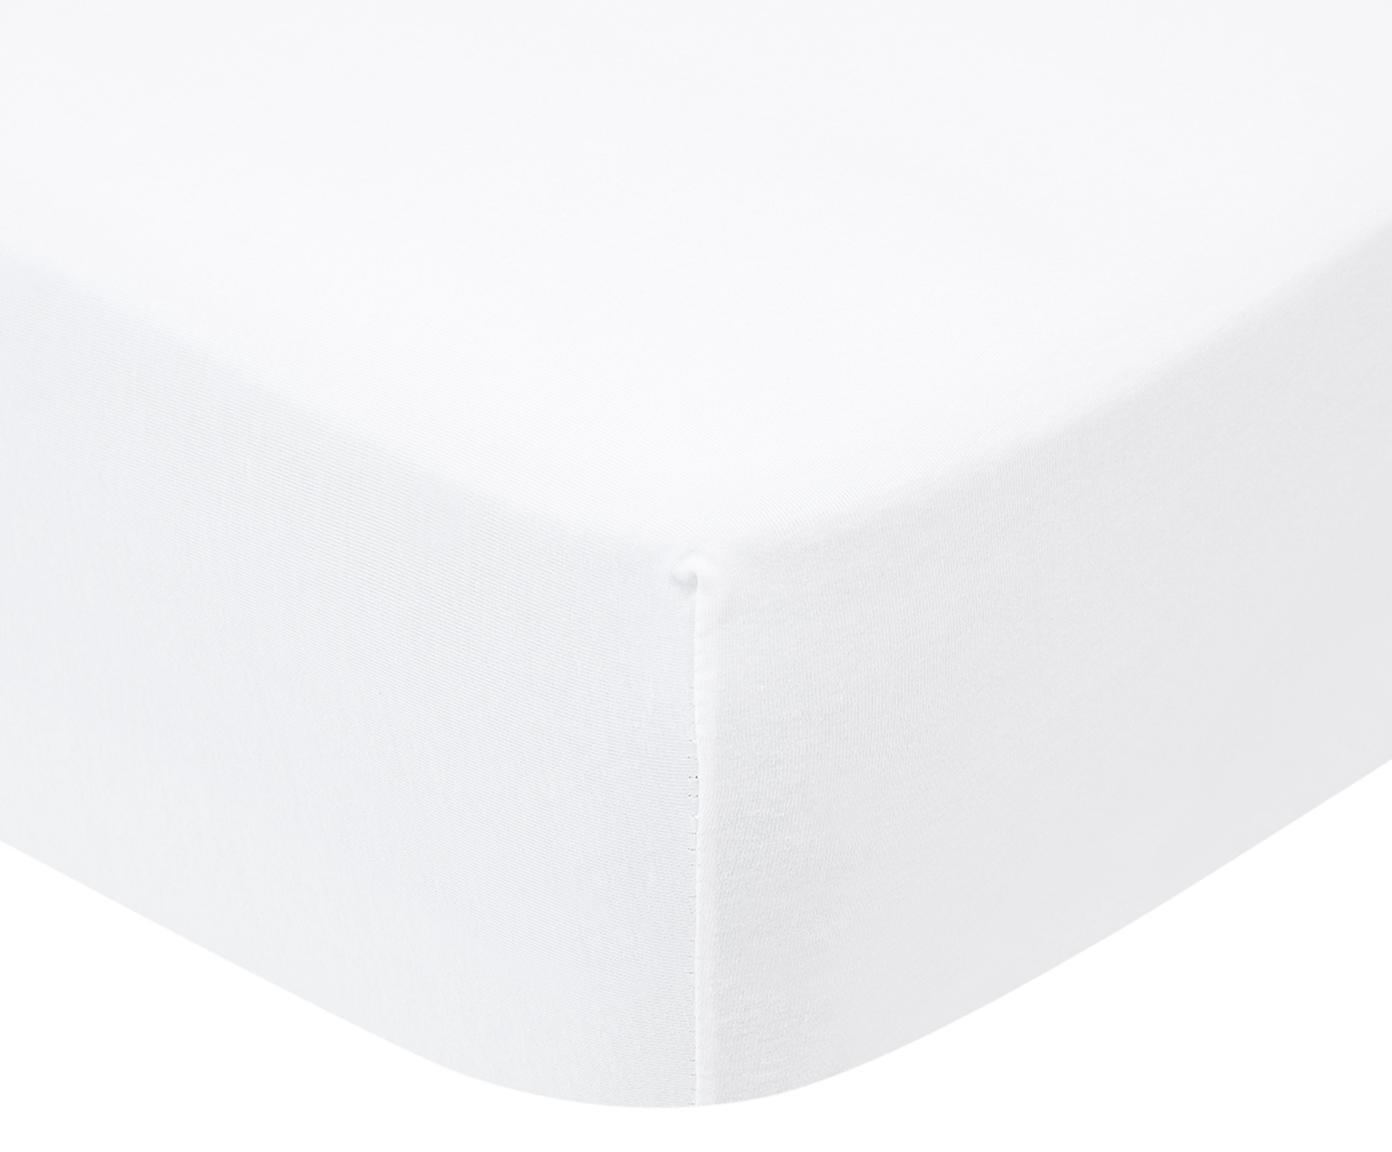 Topper-Spannbettlaken Lara, Jersey-Elasthan, 95% Baumwolle, 5% Elasthan, Weiss, 90 x 200 cm